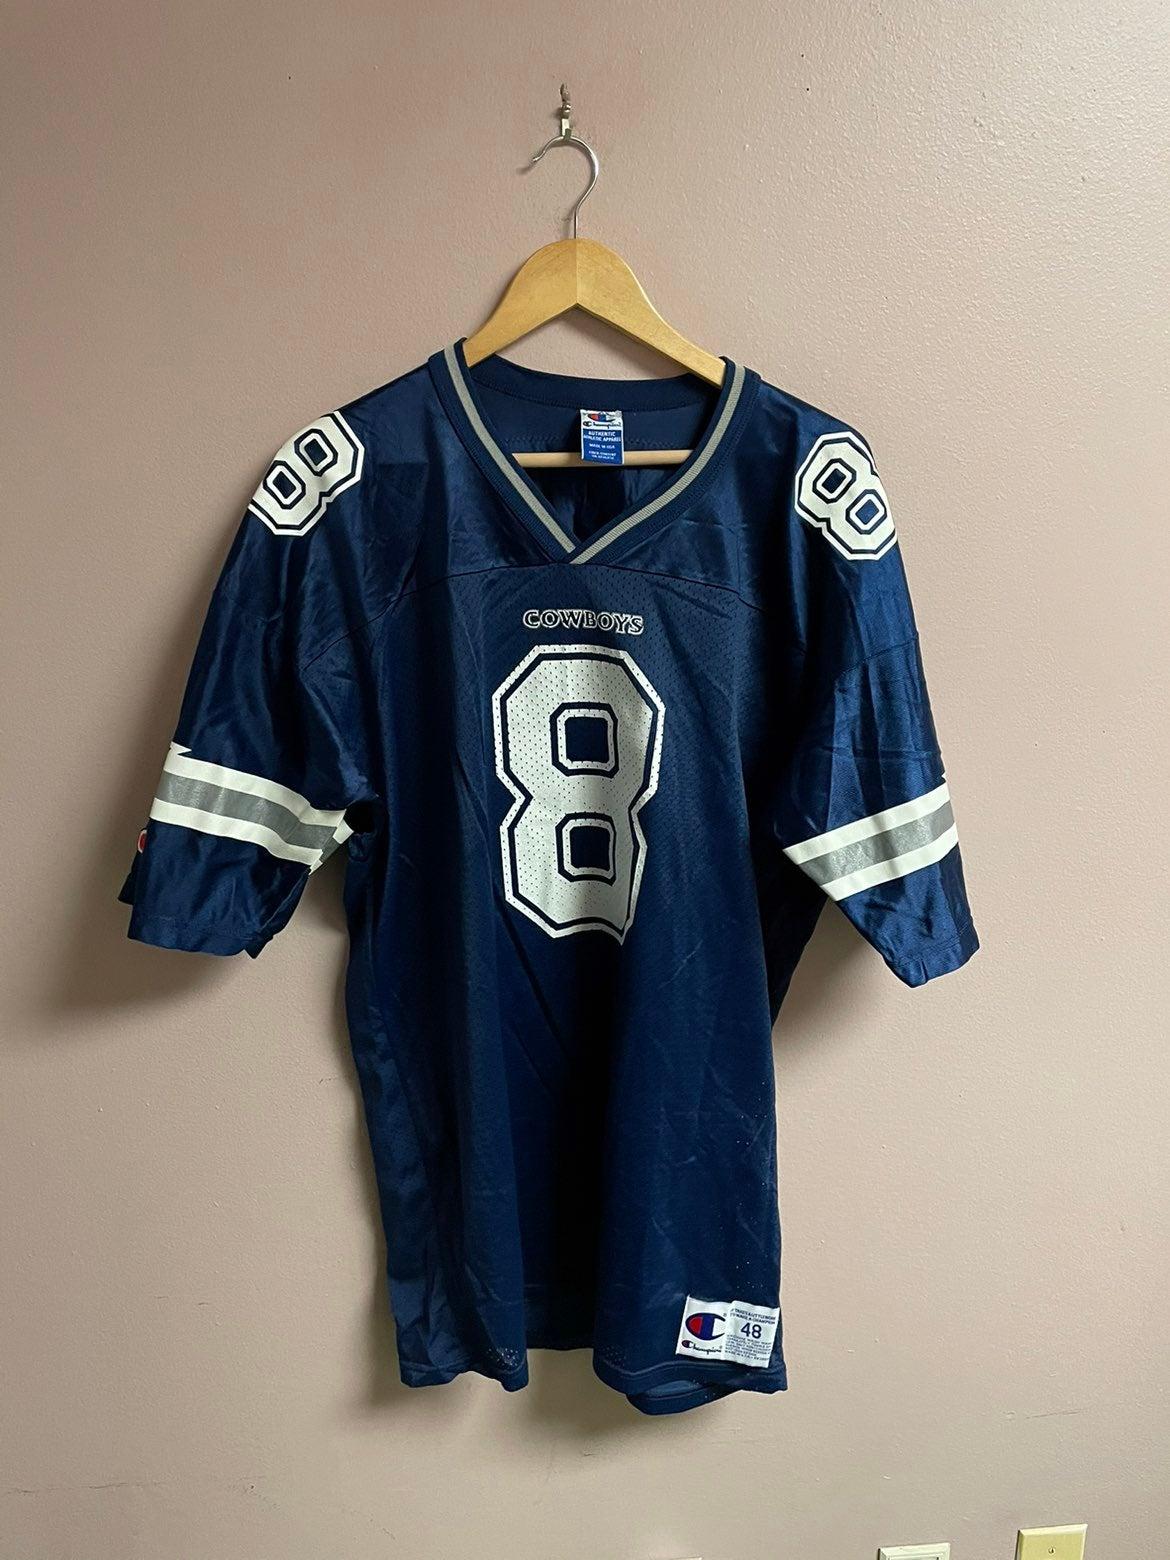 Dallas cowboys champion jersey